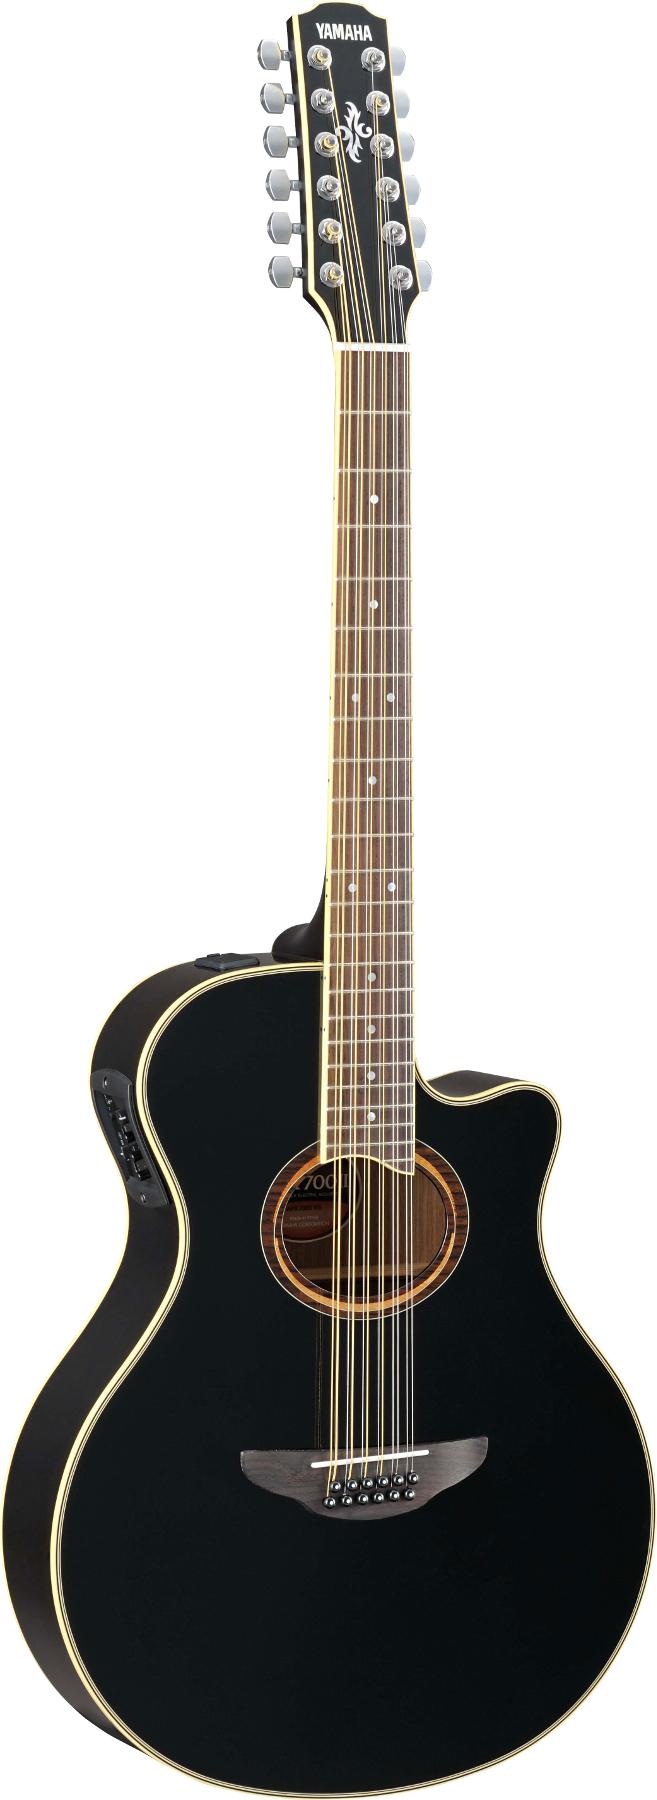 12-String APX Series Guitar, Black Finish